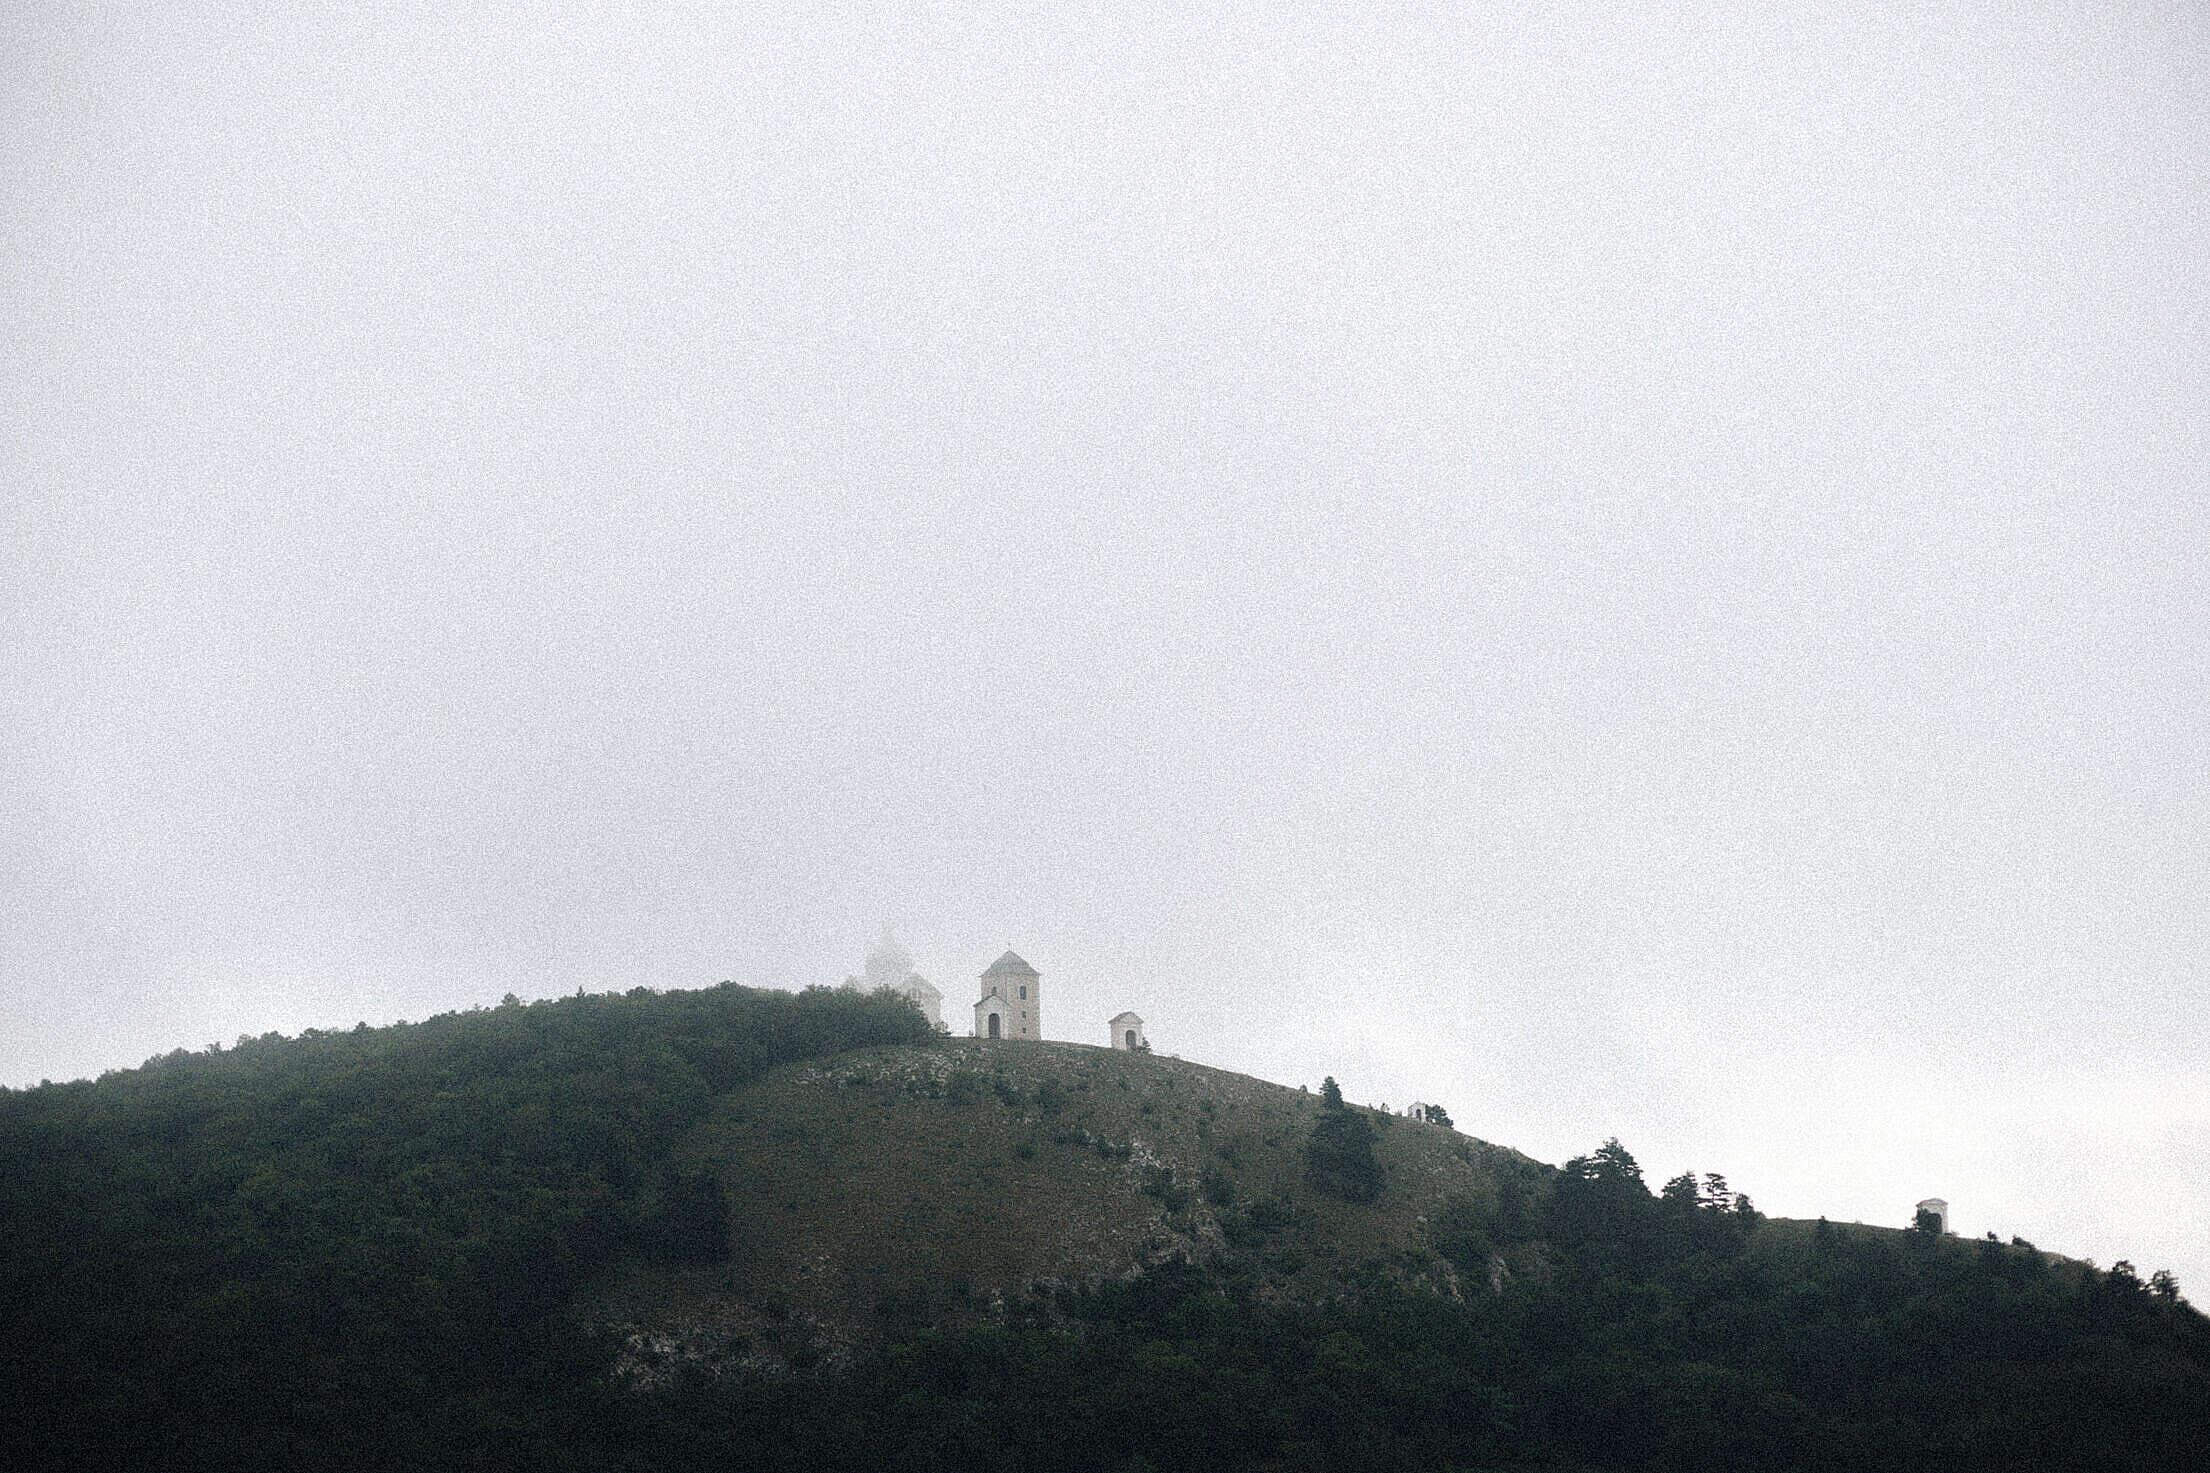 Foggy Weather on Svaty Kopecek in Mikulov, South Moravia Free Stock Photo